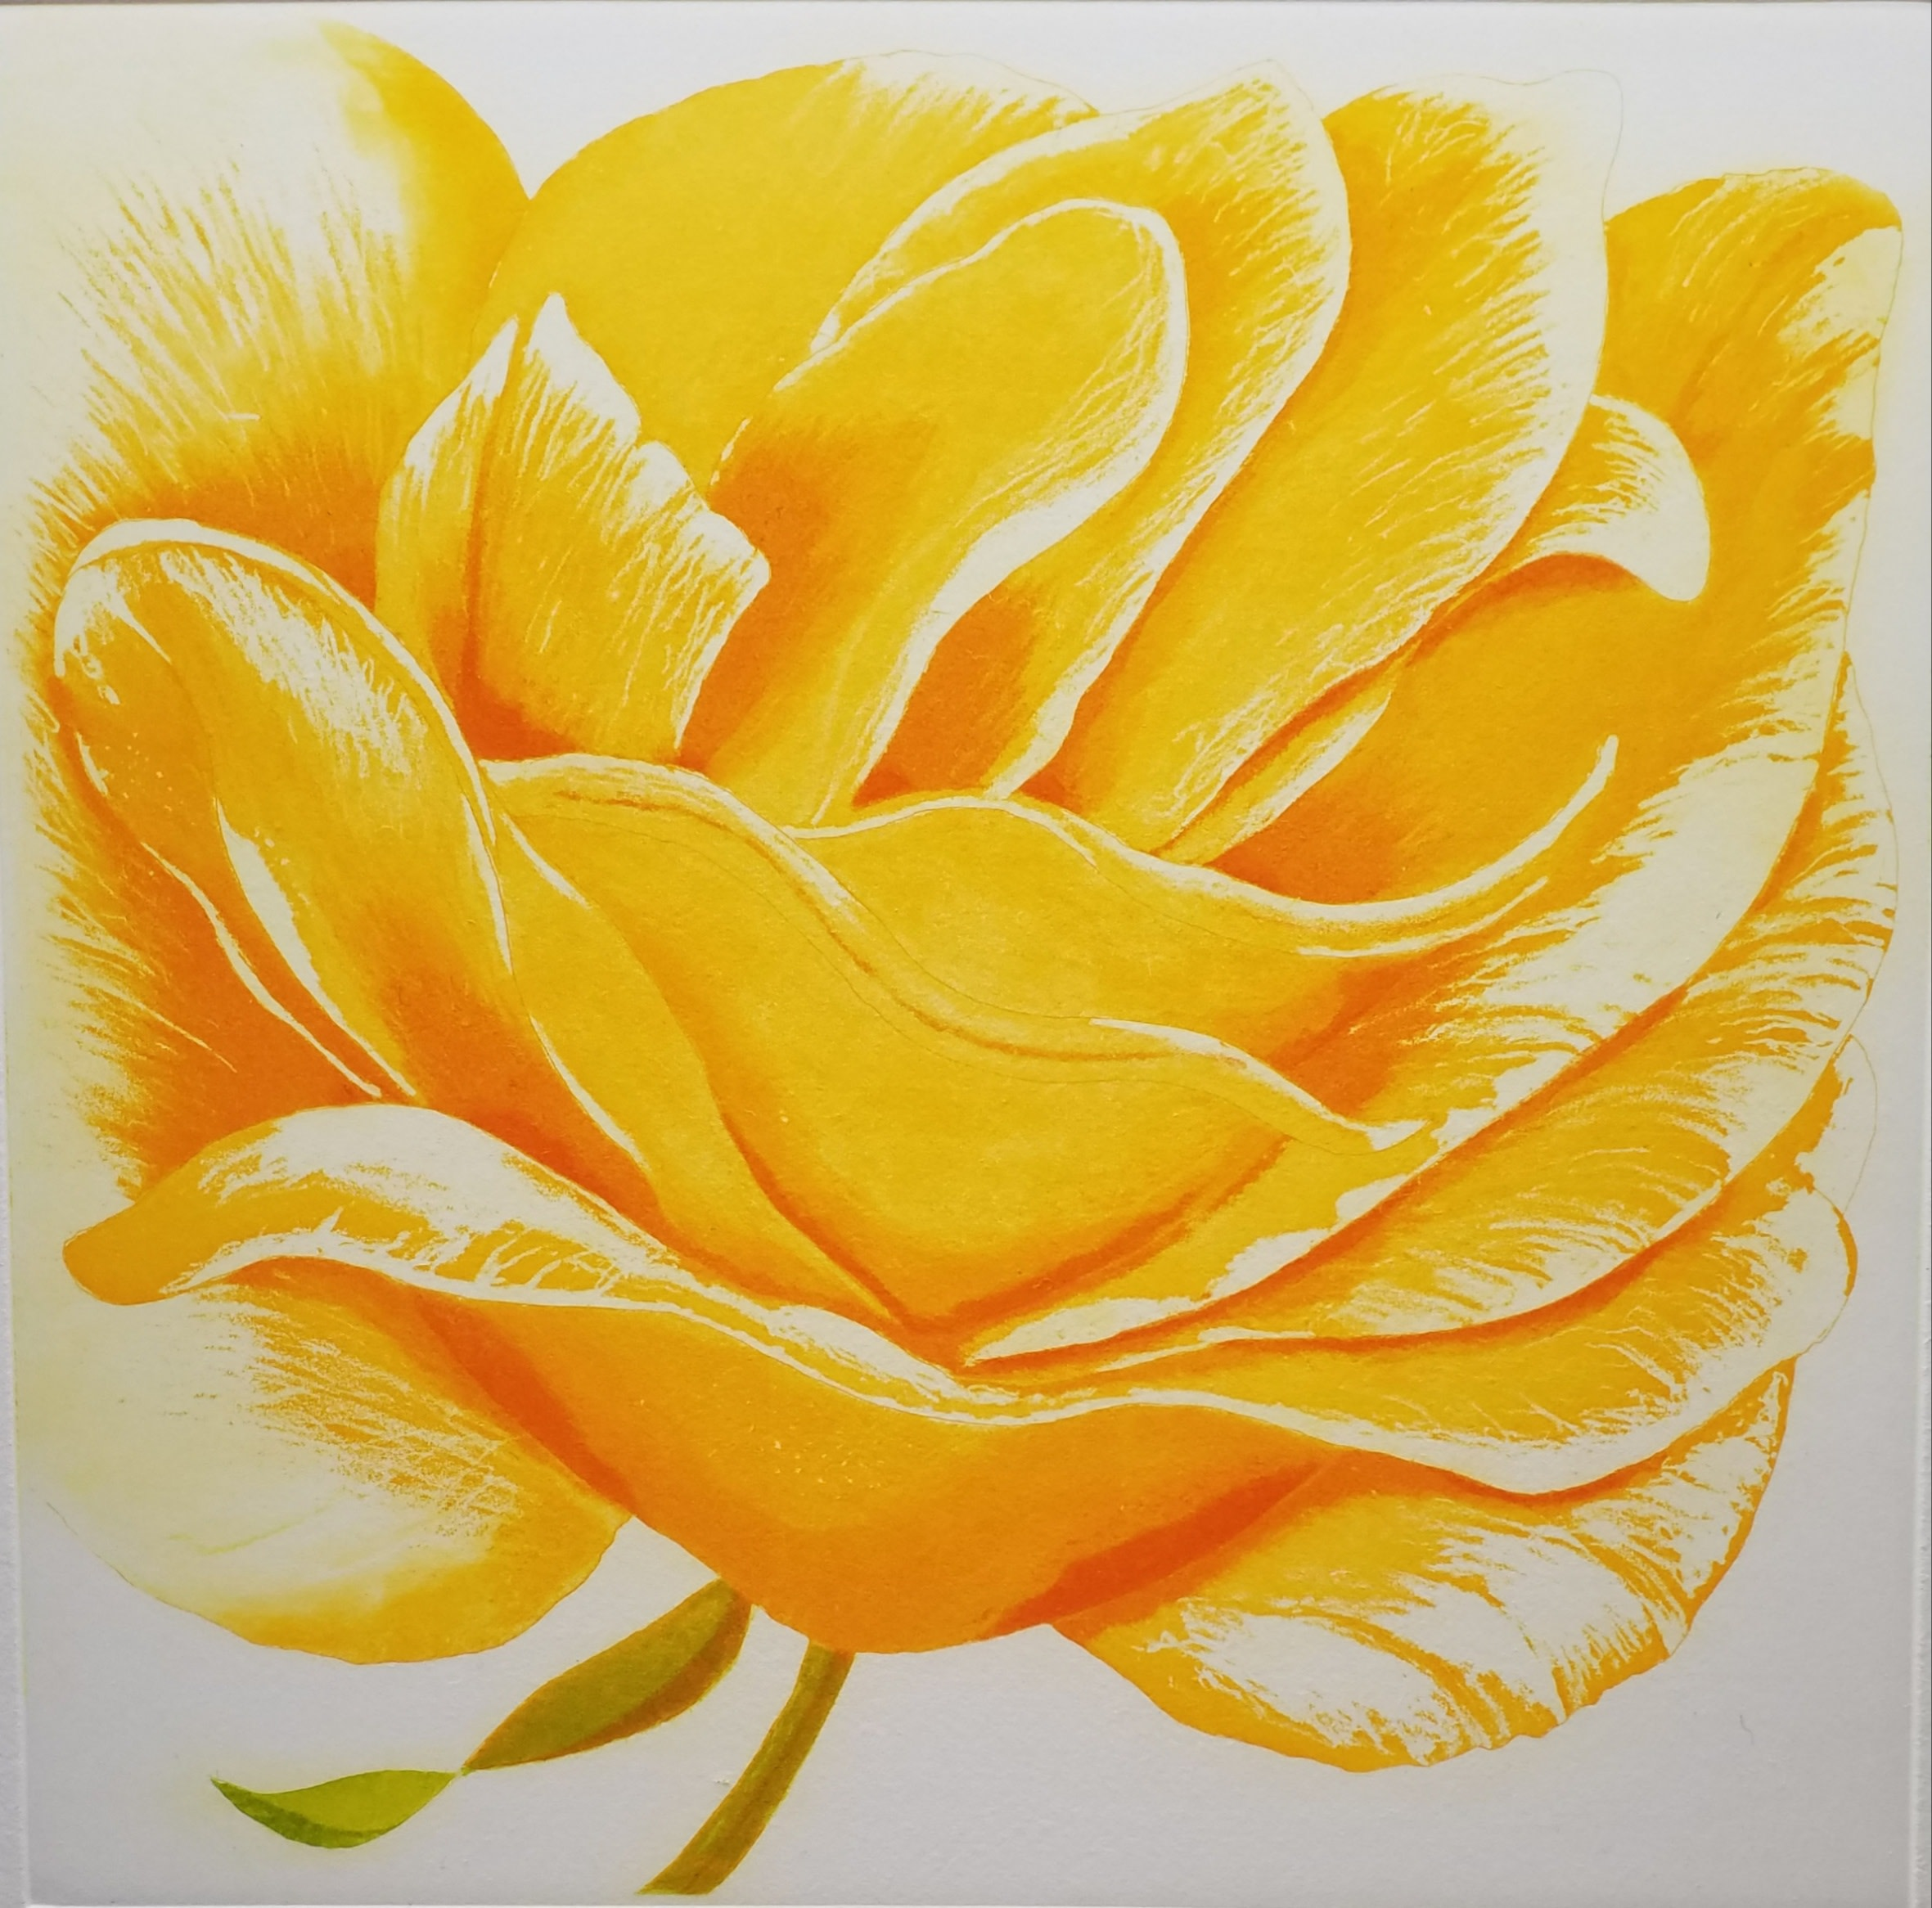 "<span class=""link fancybox-details-link""><a href=""/artists/329-grainne-cuffe-are/works/11484/"">View Detail Page</a></span><div class=""artist""><span class=""artist""><strong>Grainne Cuffe ARE</strong></span></div><div class=""title""><em>A Golden Rose</em></div><div class=""medium"">etching</div><div class=""dimensions"">50 x 47 cm framed<br /> 21.5 x 21.5 cm image size</div><div class=""edition_details"">edition of 65</div><div class=""price"">£450.00 framed<br>£320.00 unframed</div>"